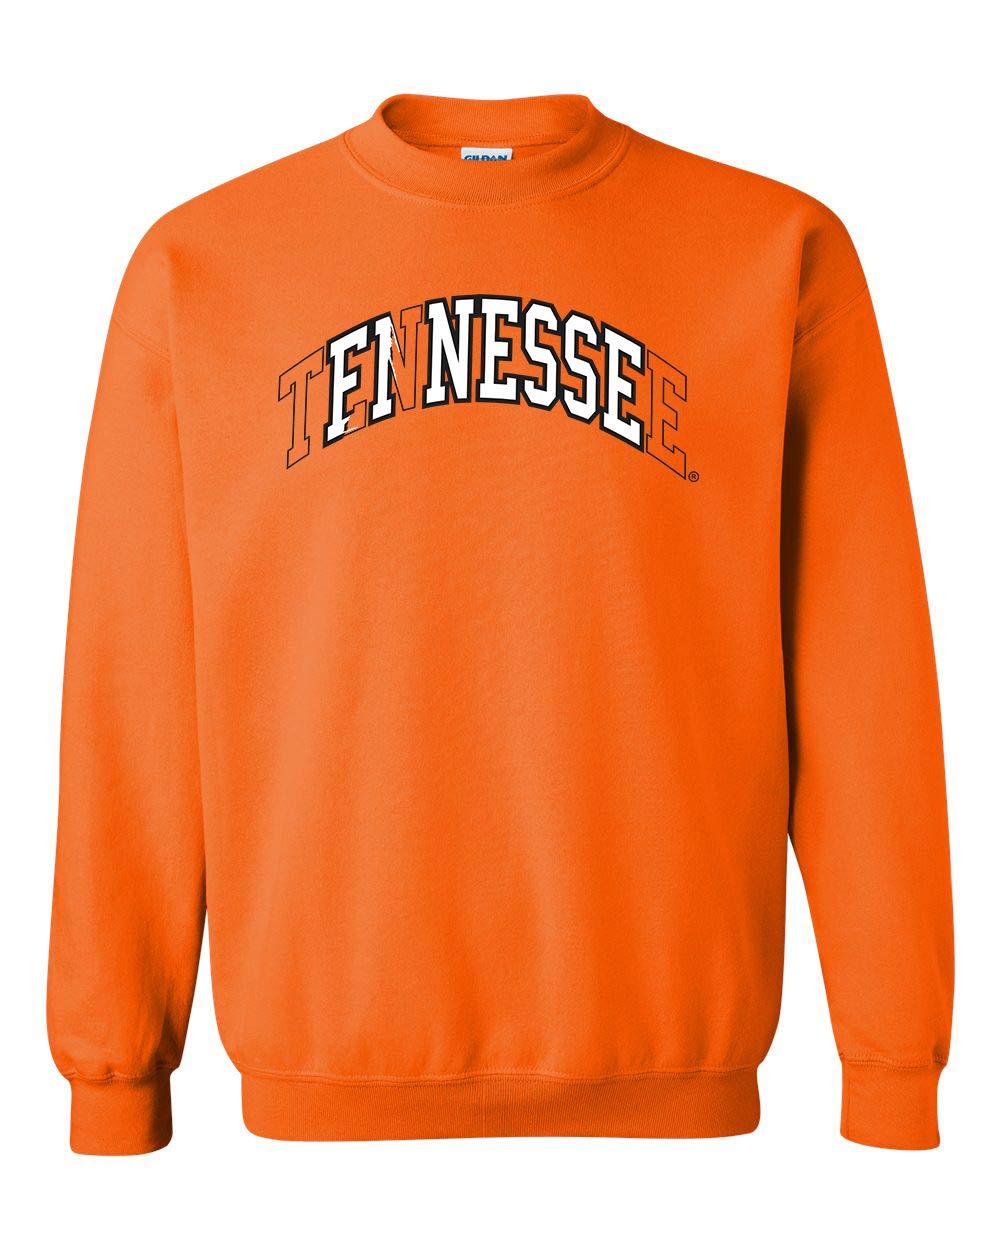 Ameritrends Finesse Tennessee S Crewneck Drake New Orange Shirts